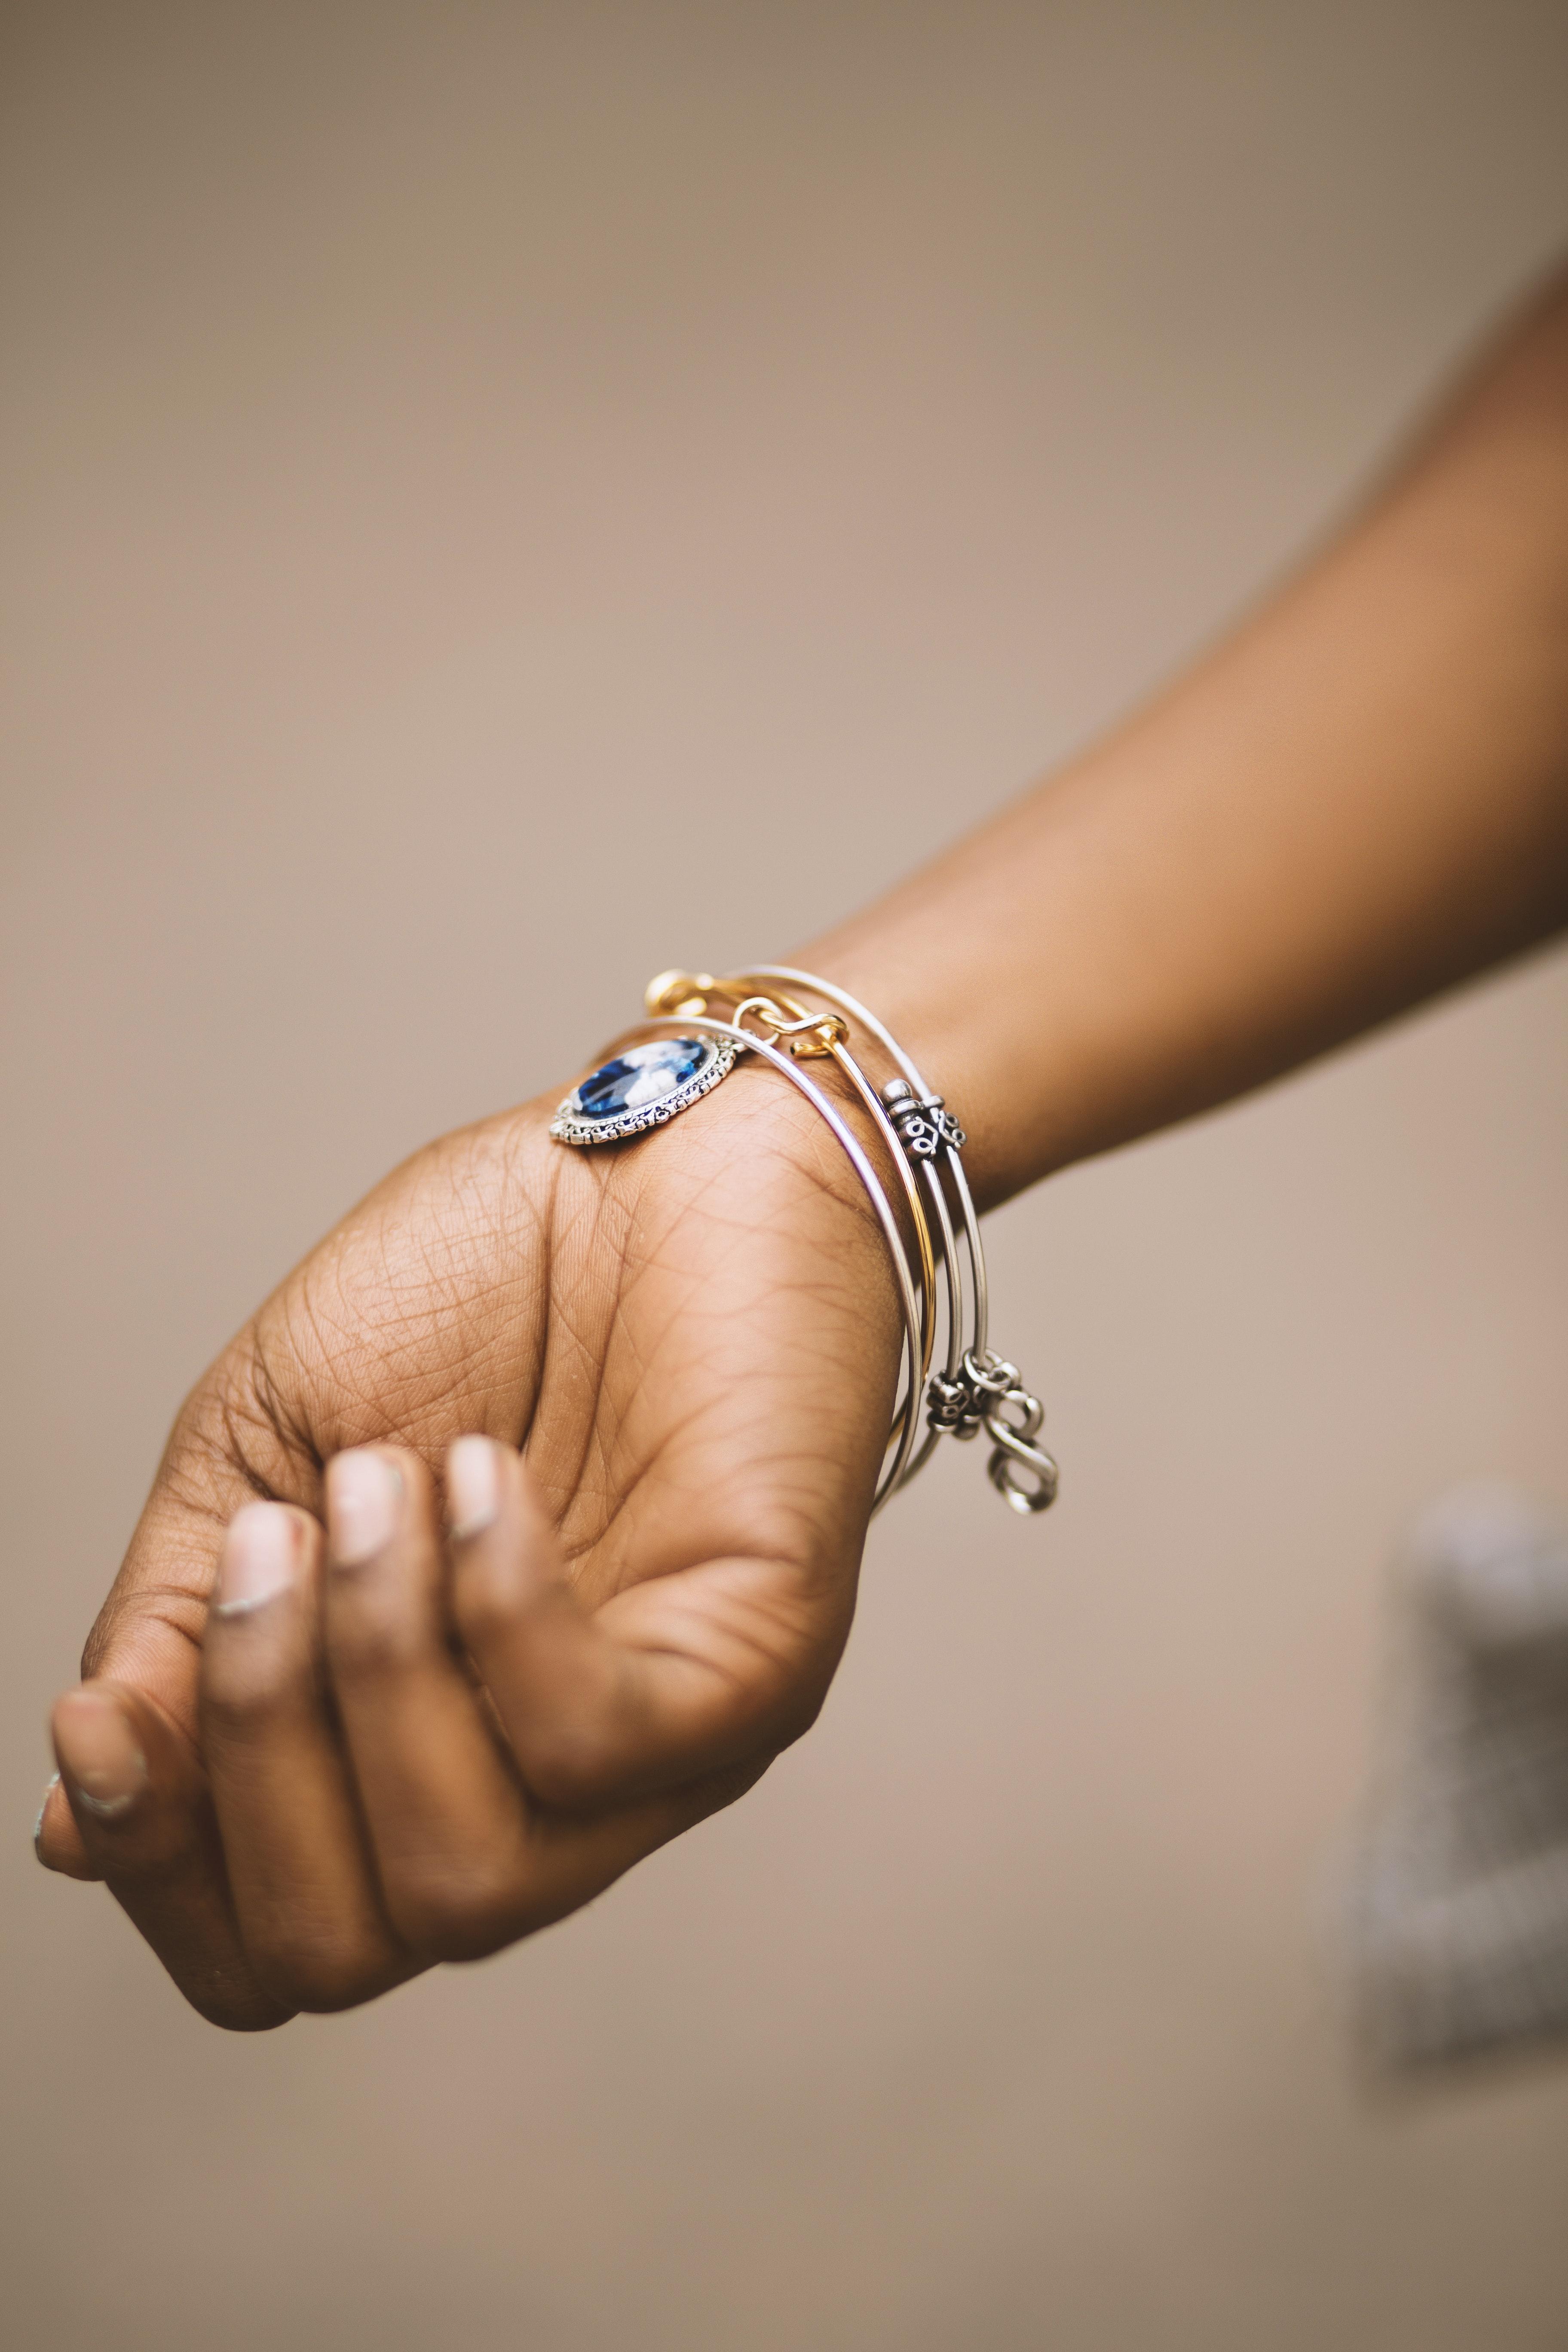 o que significa sonhar com pulseiras